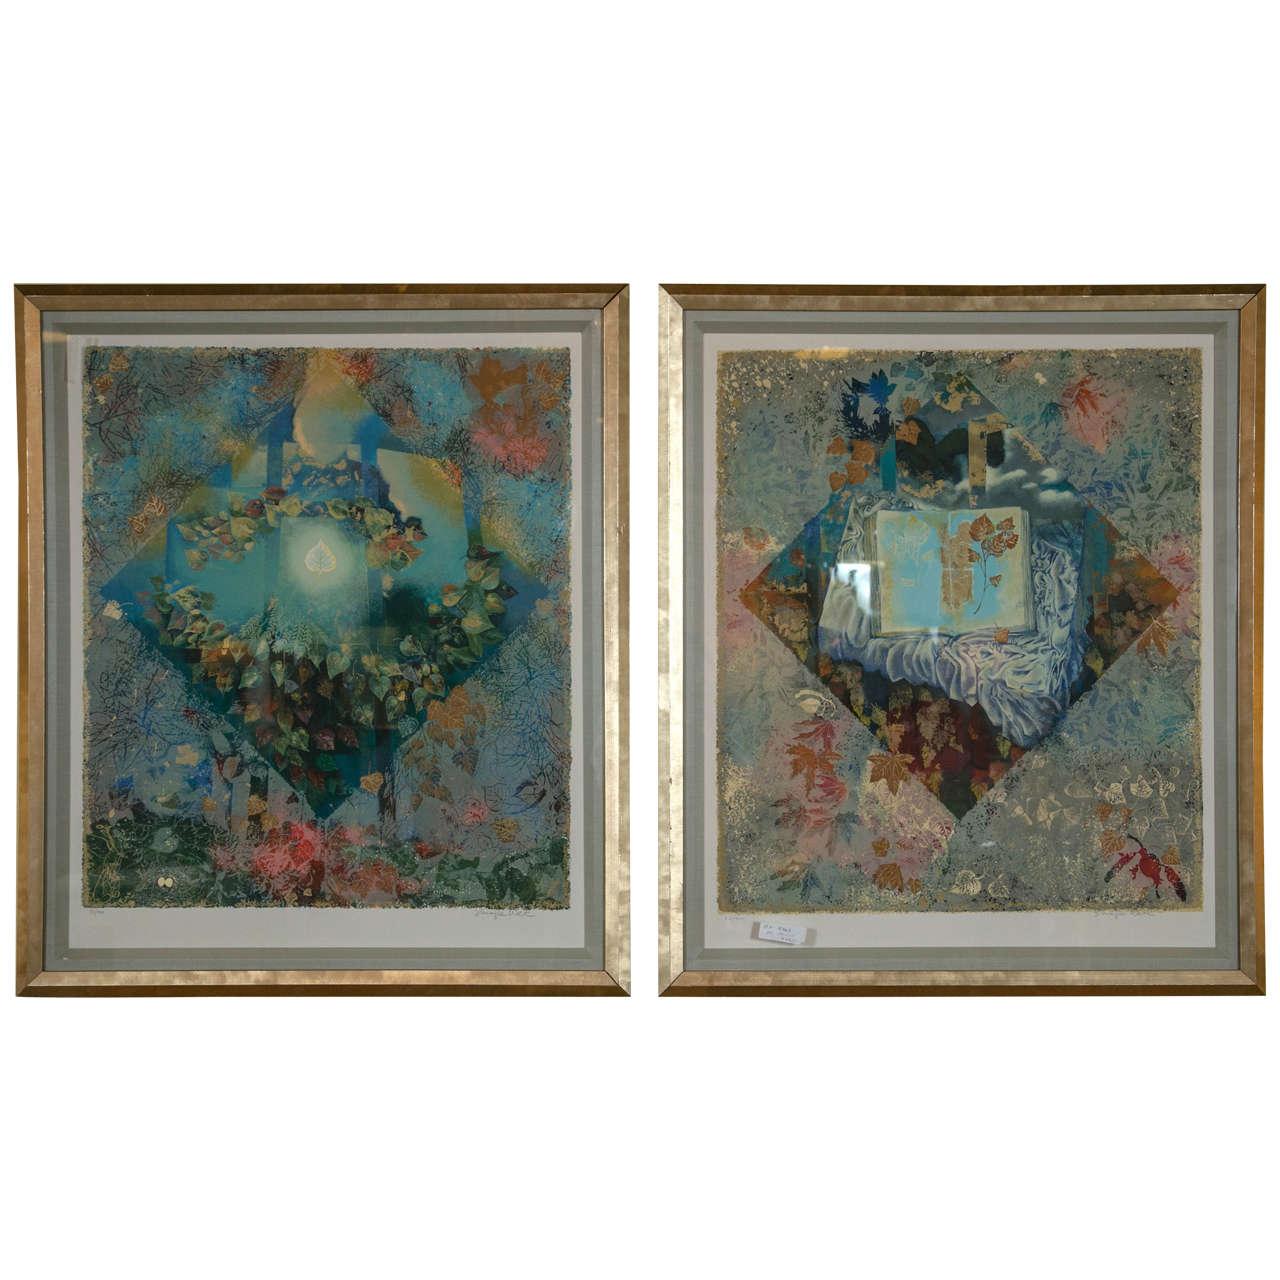 Pair of Framed Serigraphs Signed and Numbered Shraga Weil Hebrew